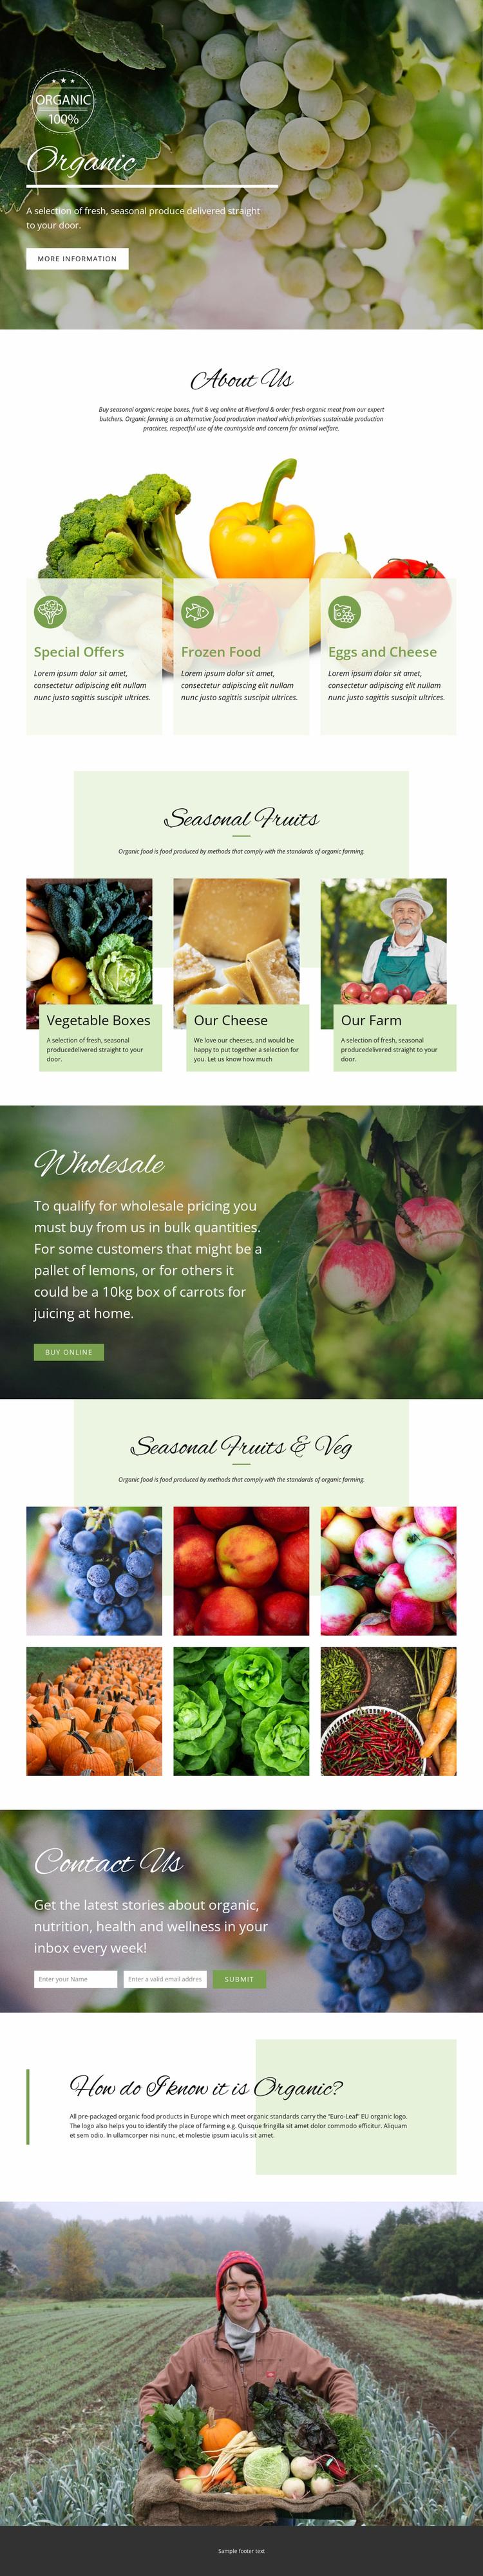 Healthier with organic food Website Design